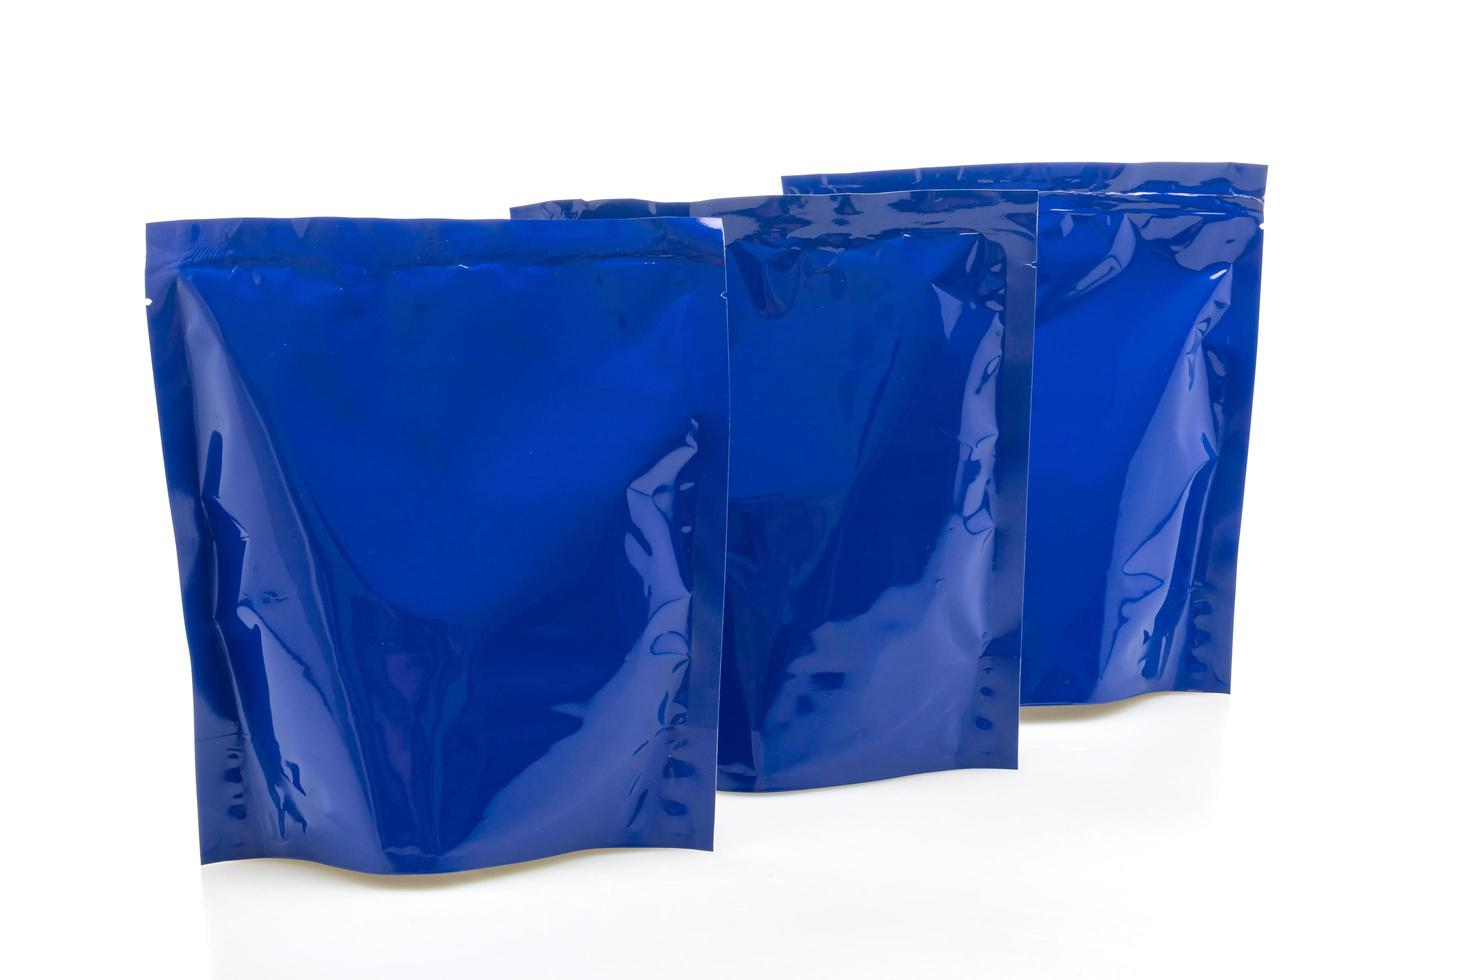 Bolsa de plástico azul para embalaje aislado sobre fondo blanco. foto